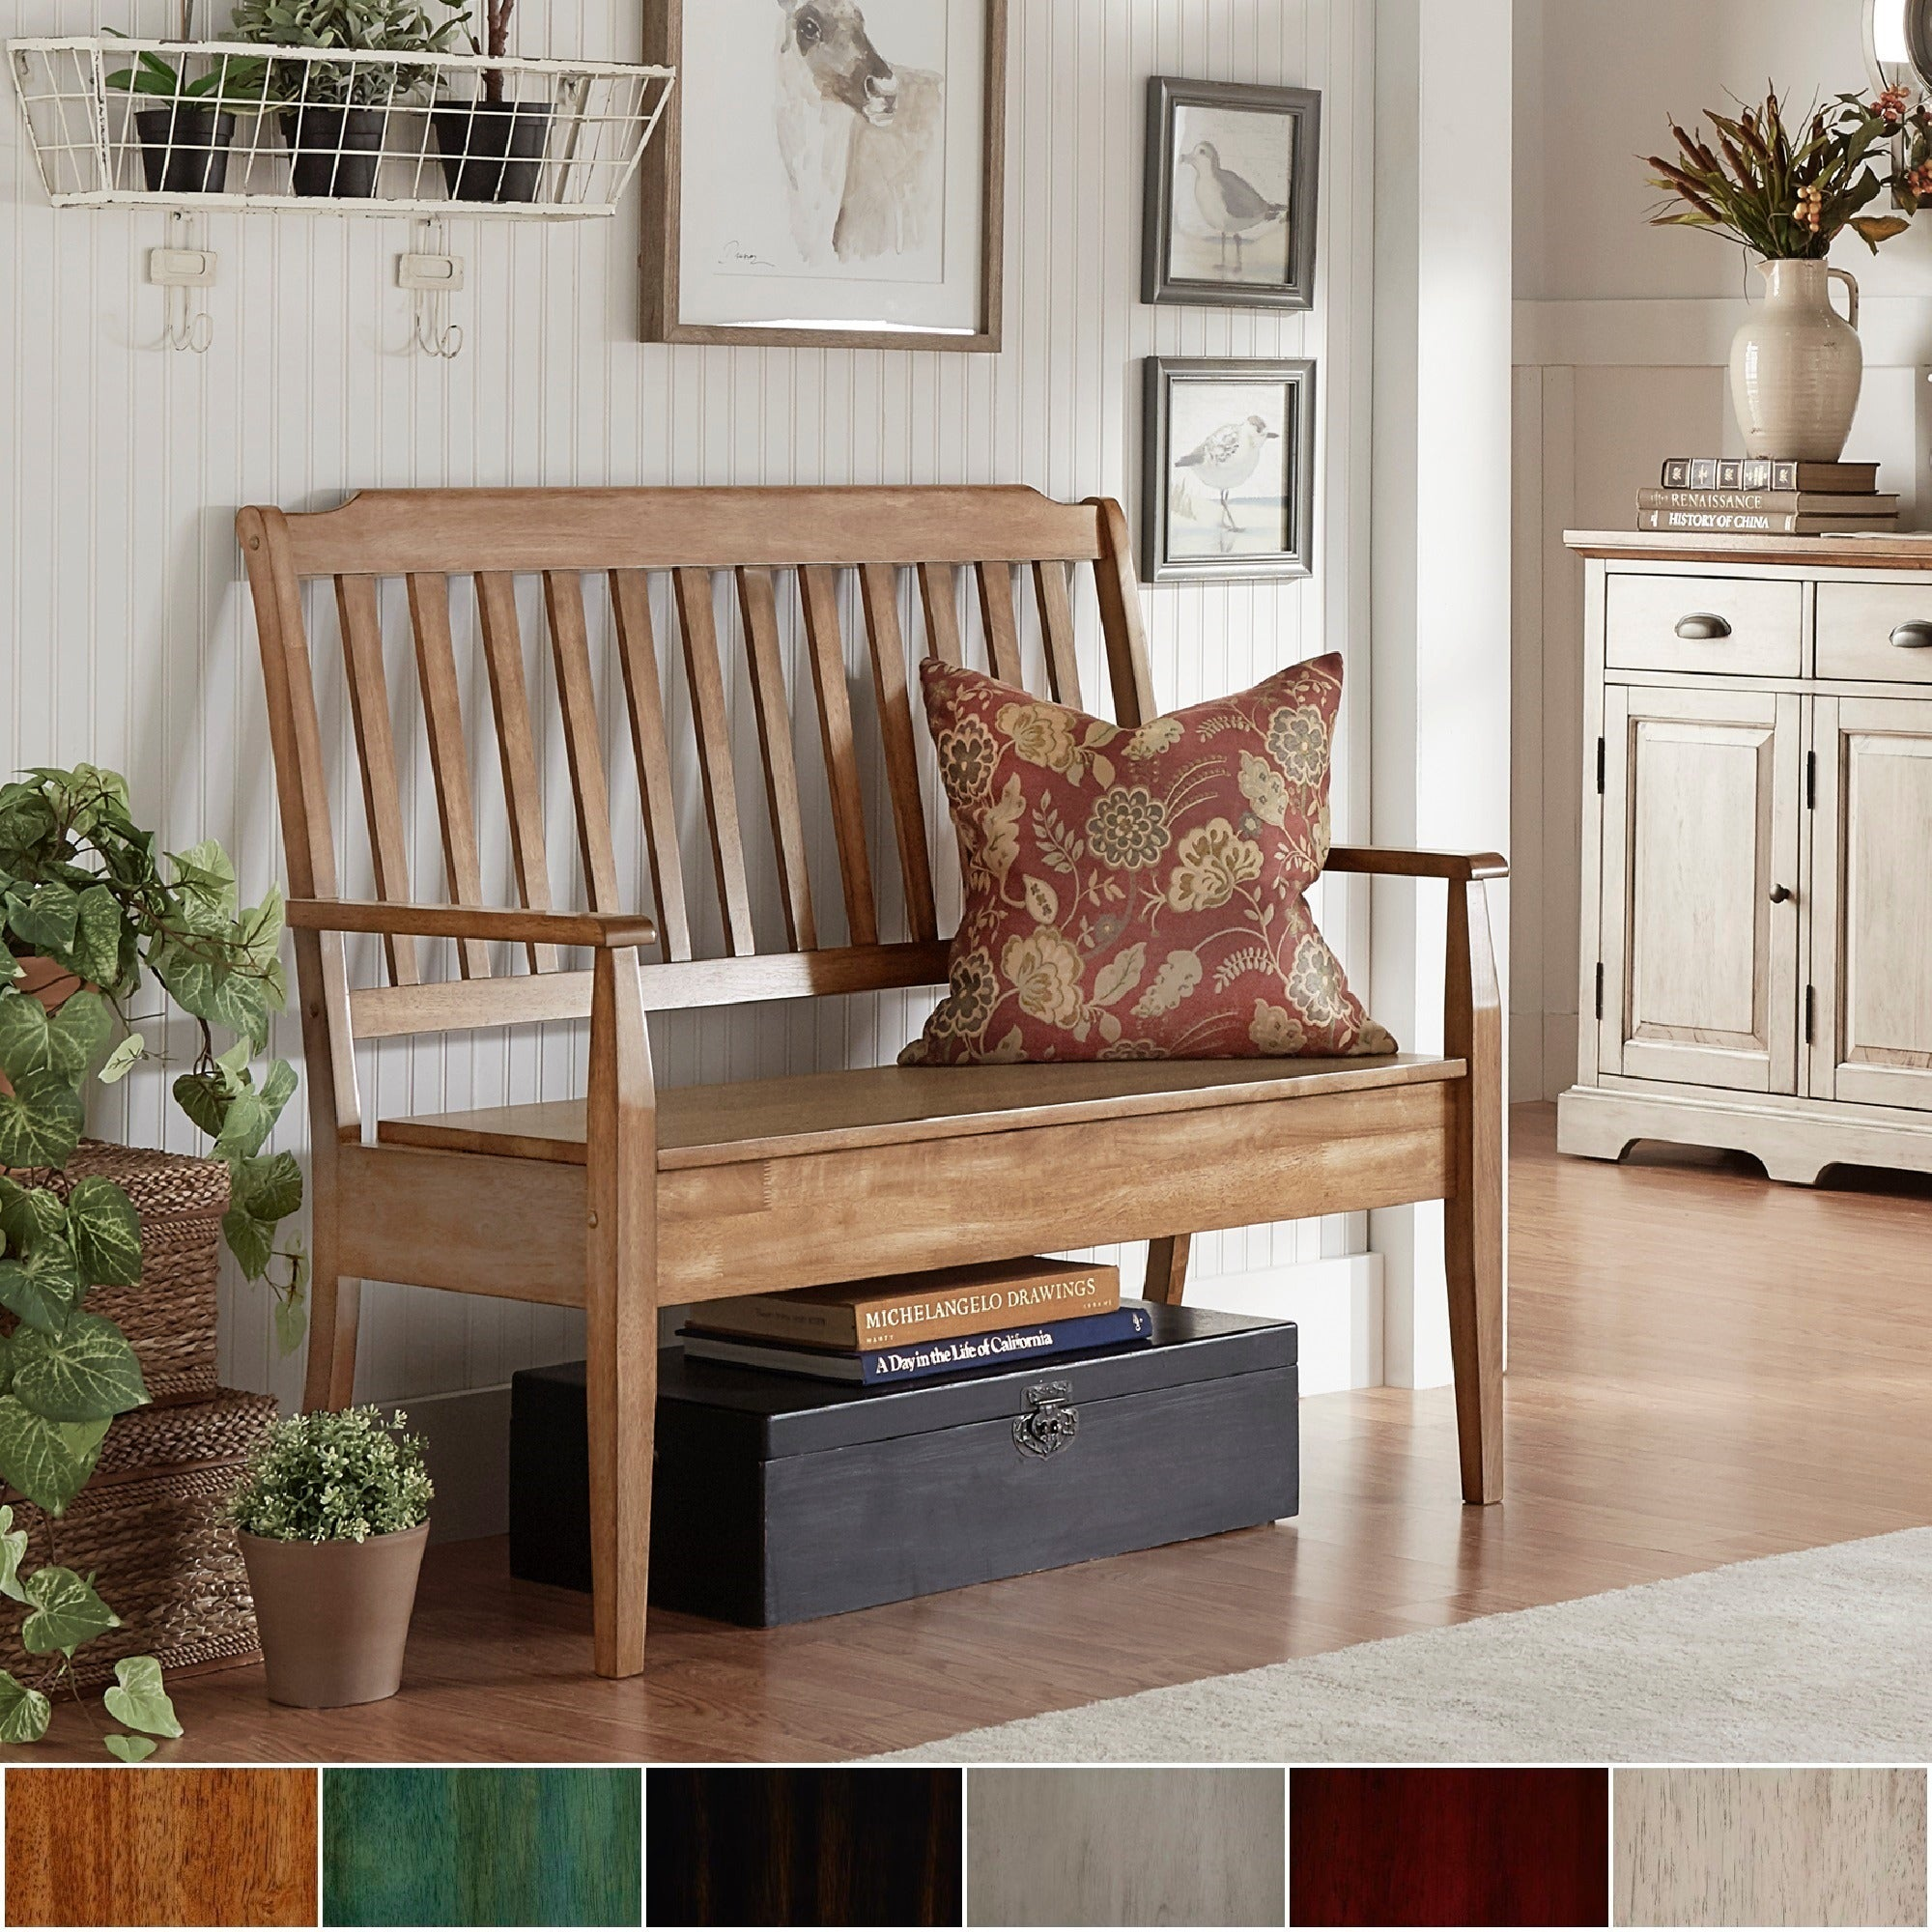 Eleanor-Slat-Back-Wood-Storage-Bench-by-iNSPIRE-